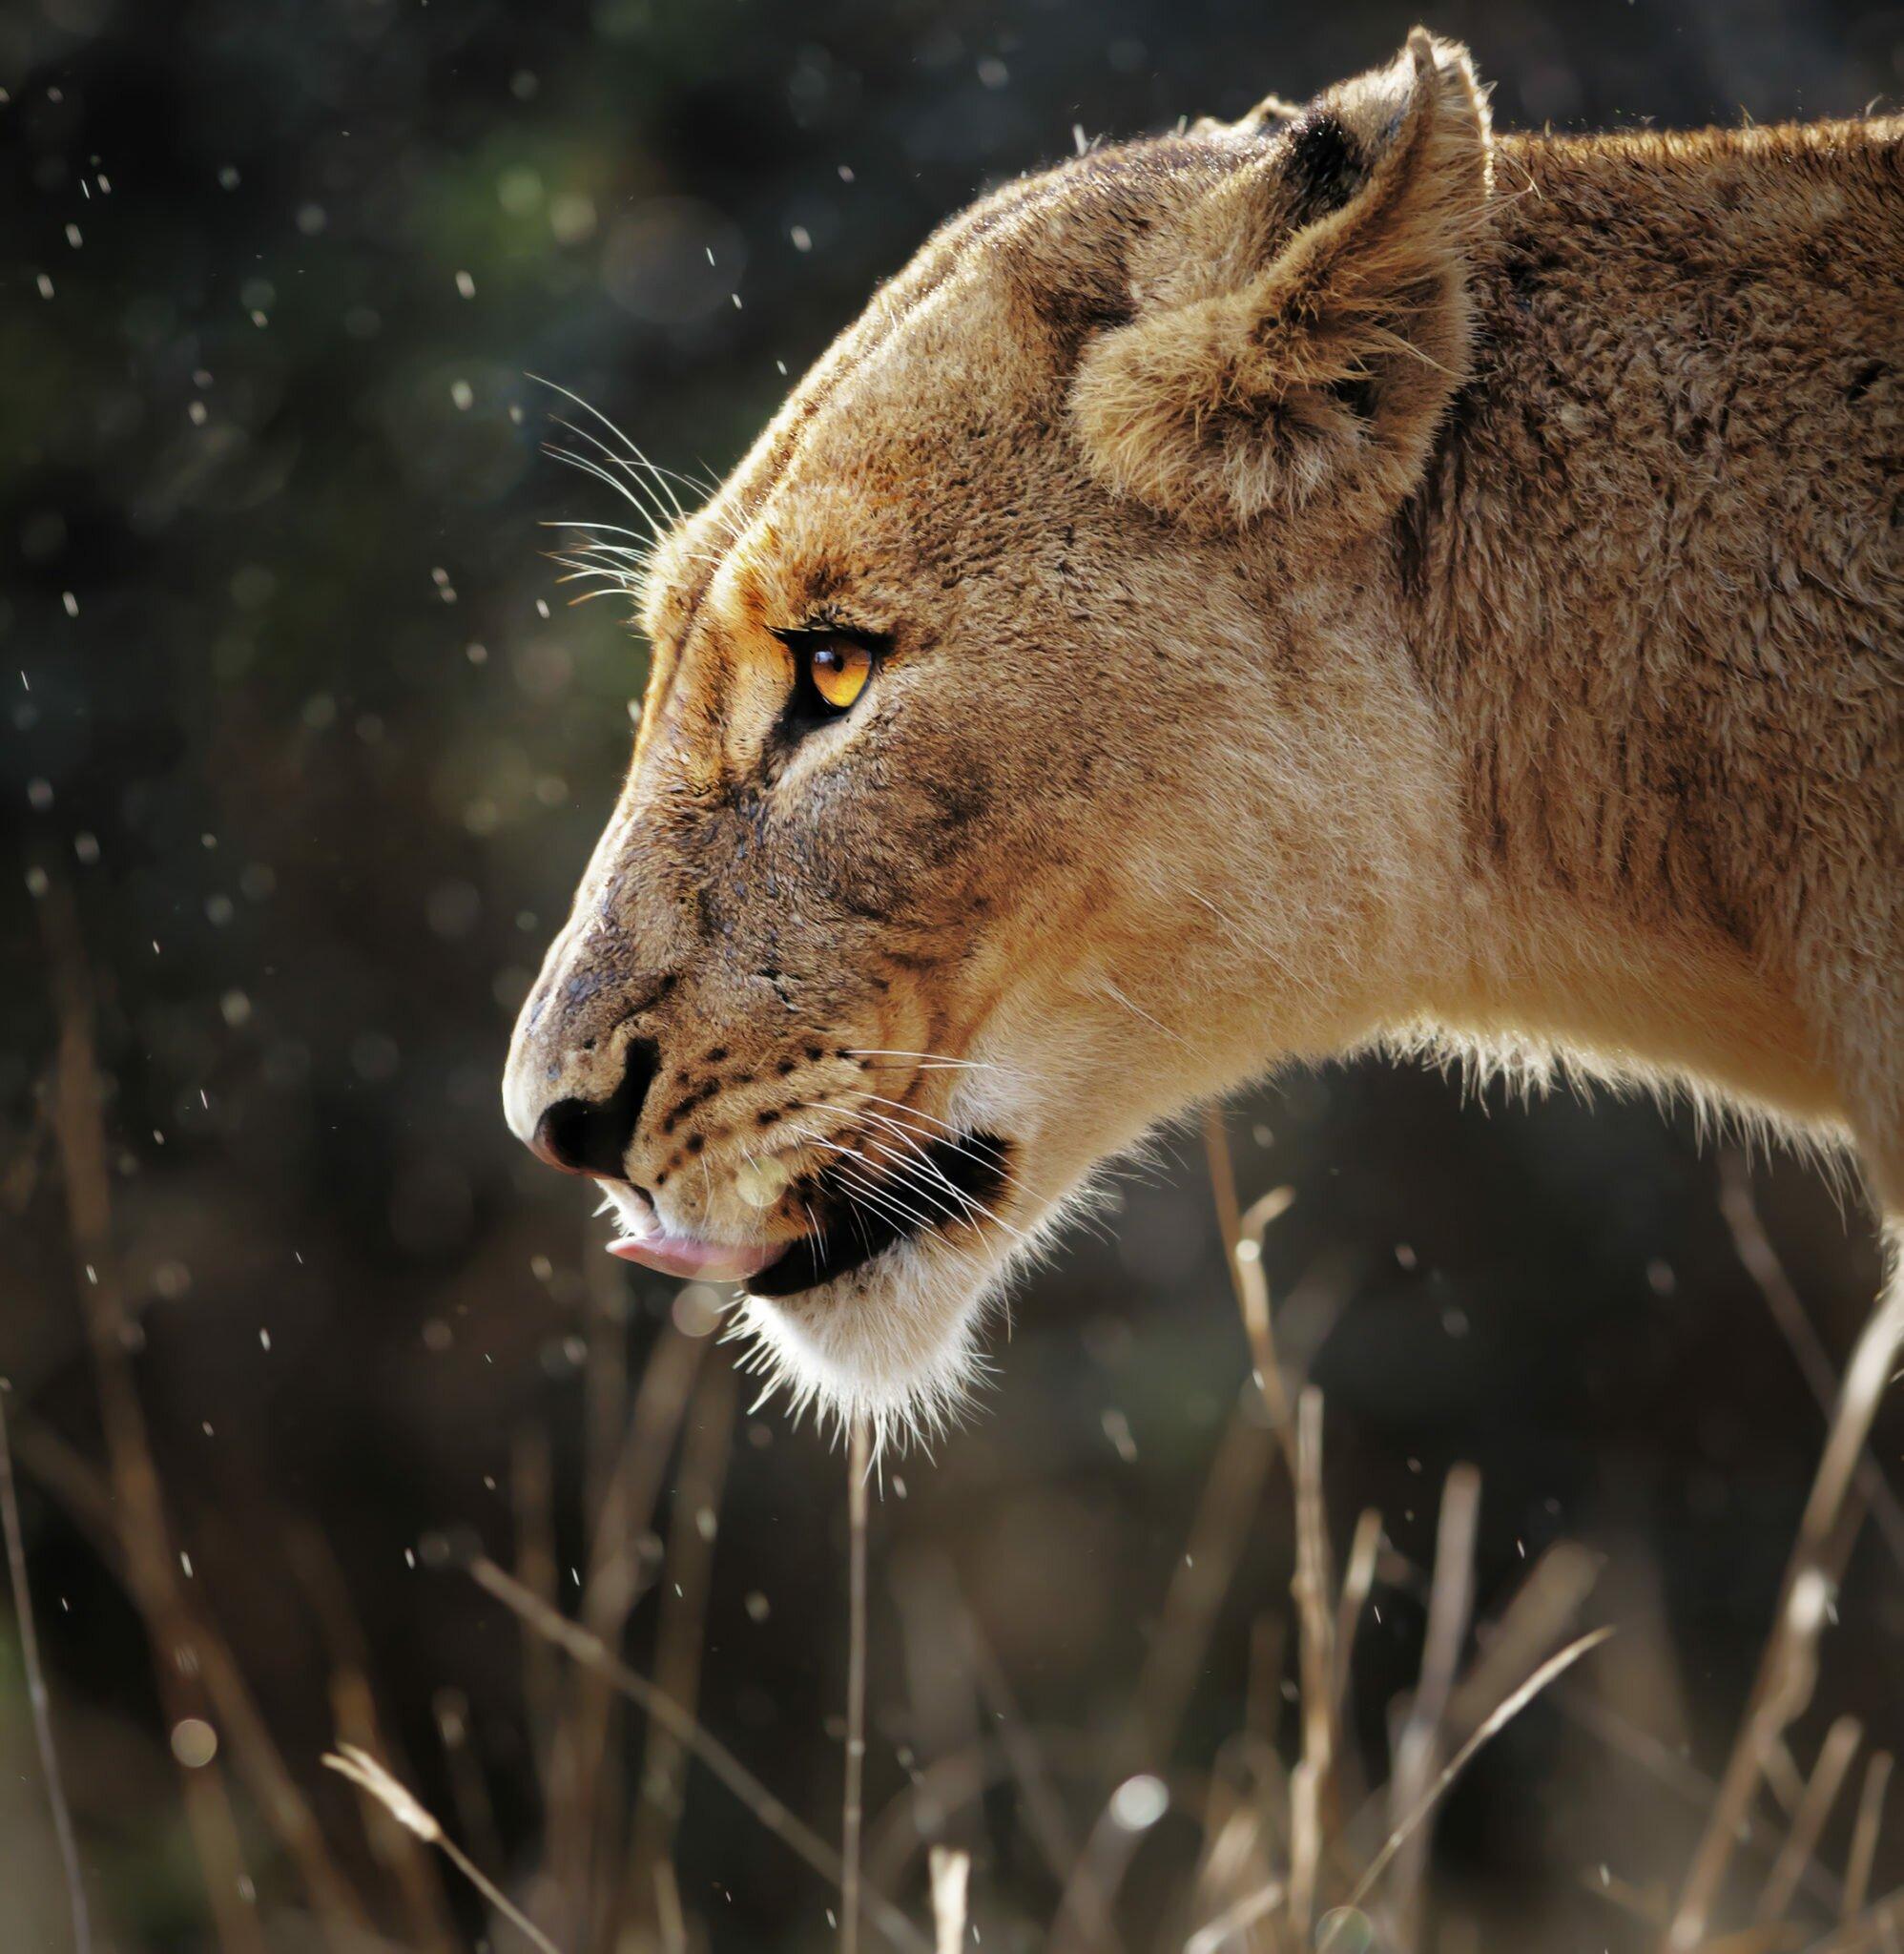 Lioness side profile close up